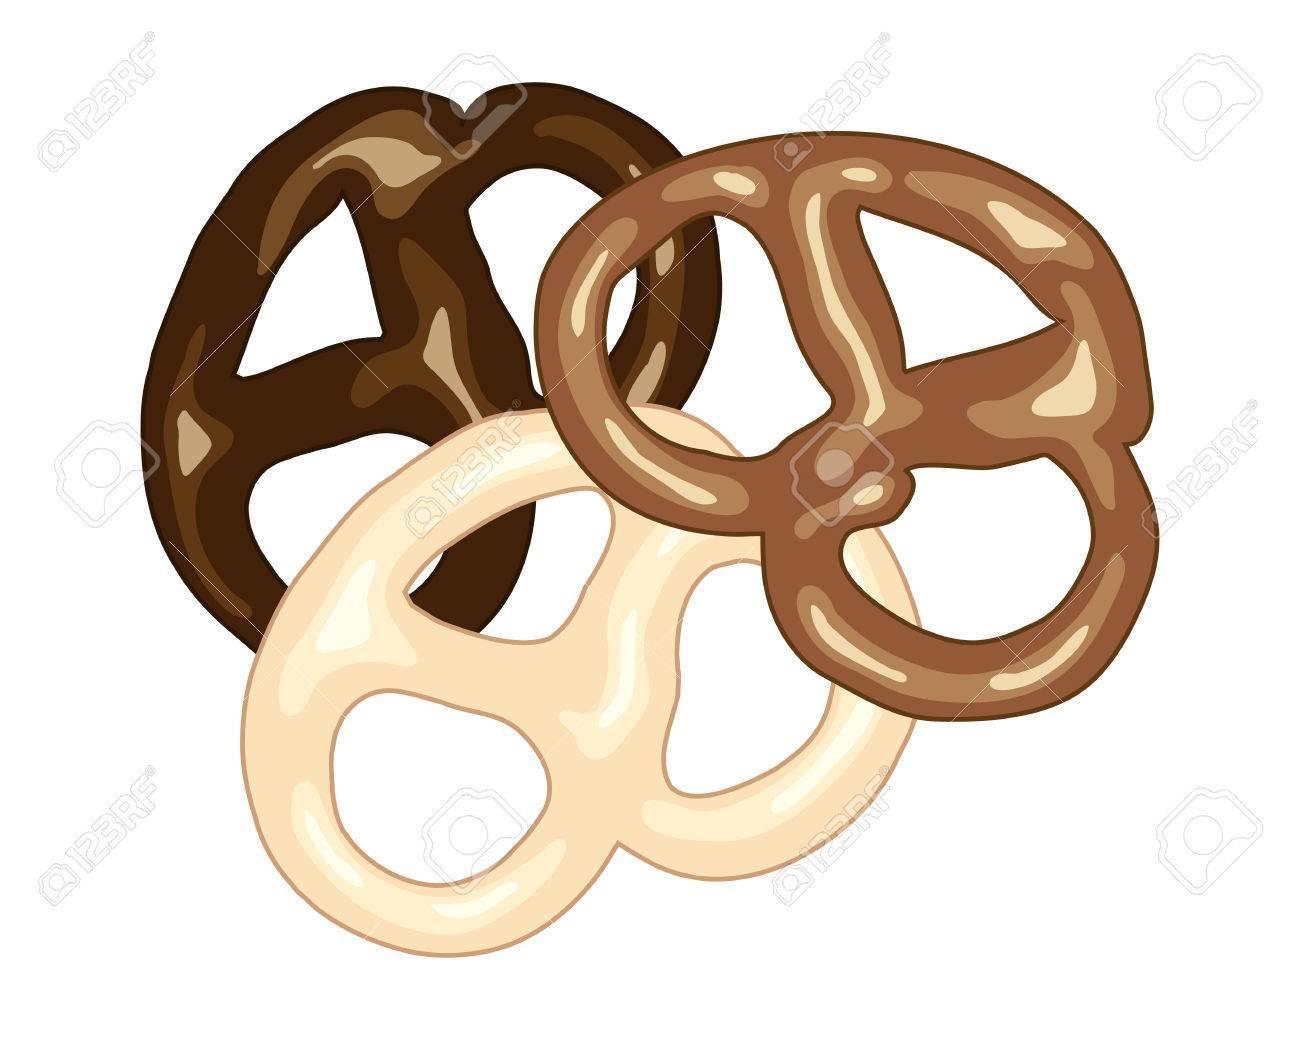 Chocolate pretzels clipart svg library Chocolate pretzels » Clipart Portal svg library